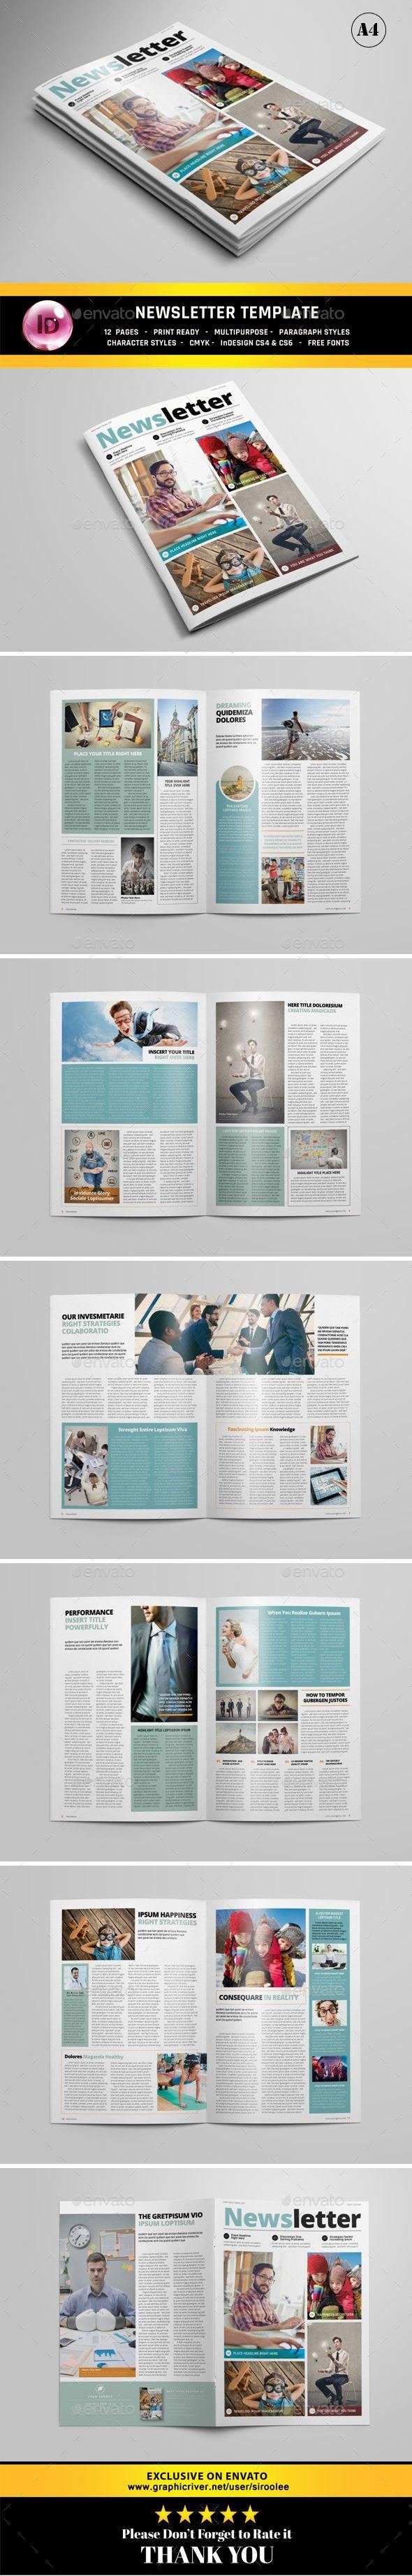 Multipurpose Newsletter Design Template - Newsletters Print Templates InDesign INDD. Download here: https://graphicriver.net/item/multipurpose-newsletter/16991901?s_rank=179&ref=yinkira